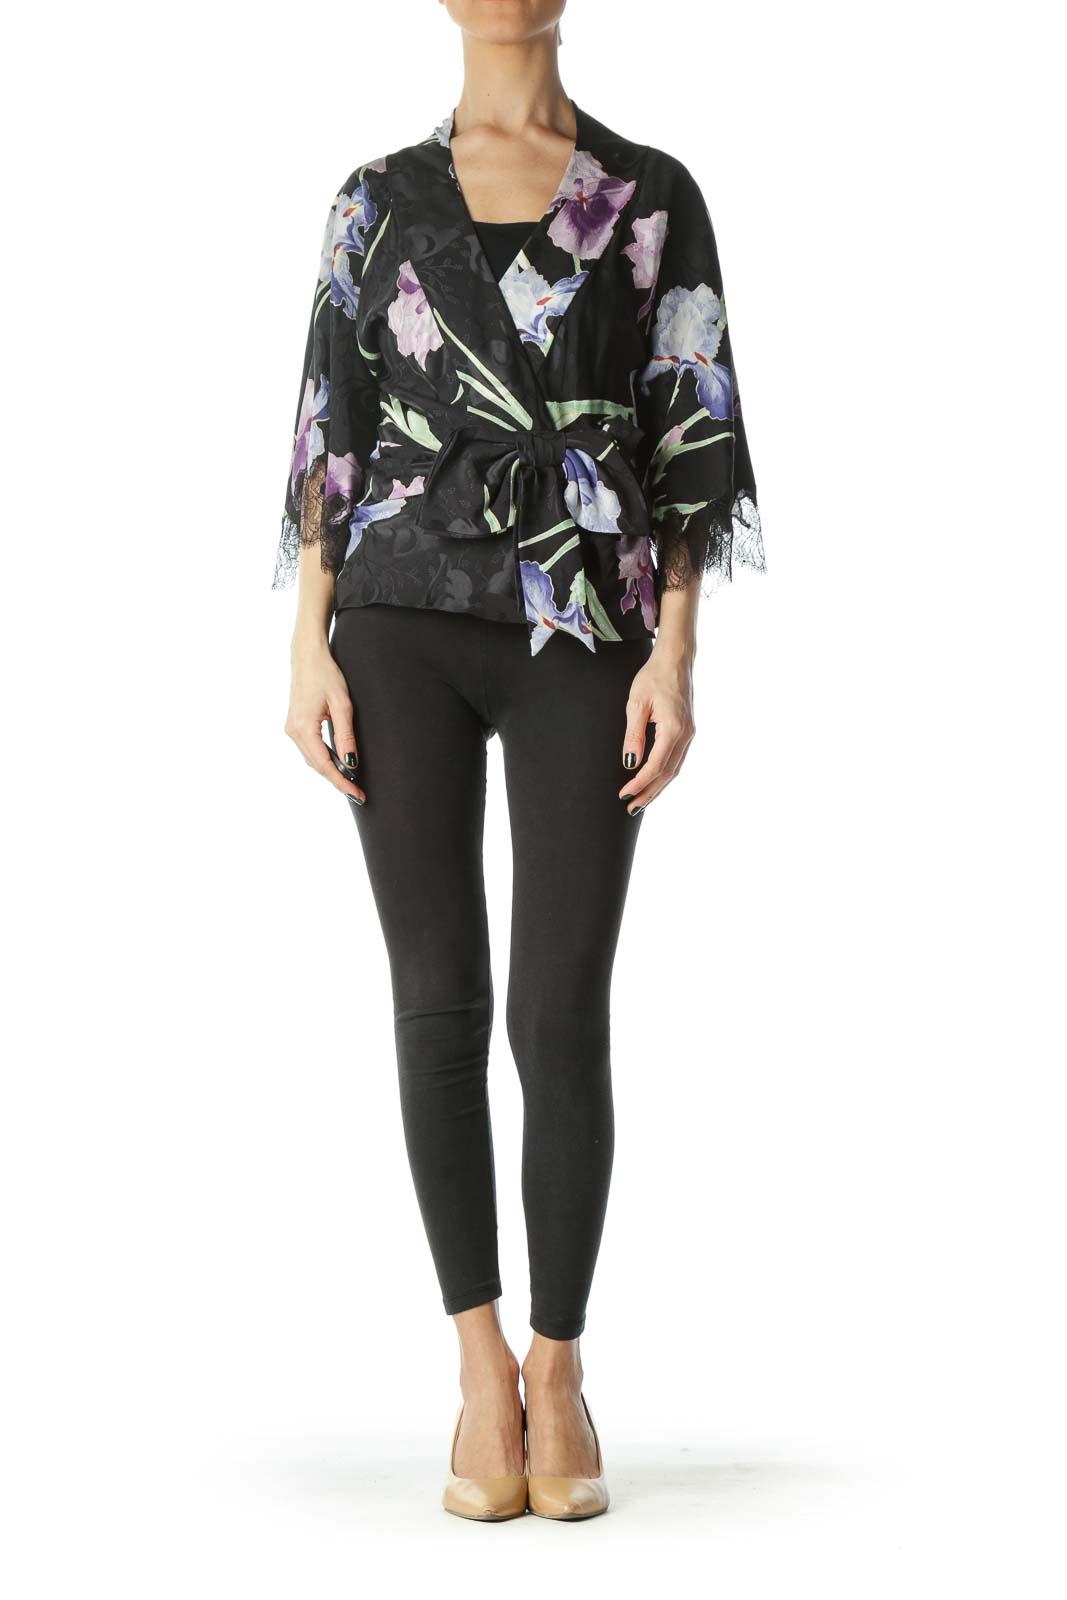 Multicolored Flower Print 100% Silk Light Jacket